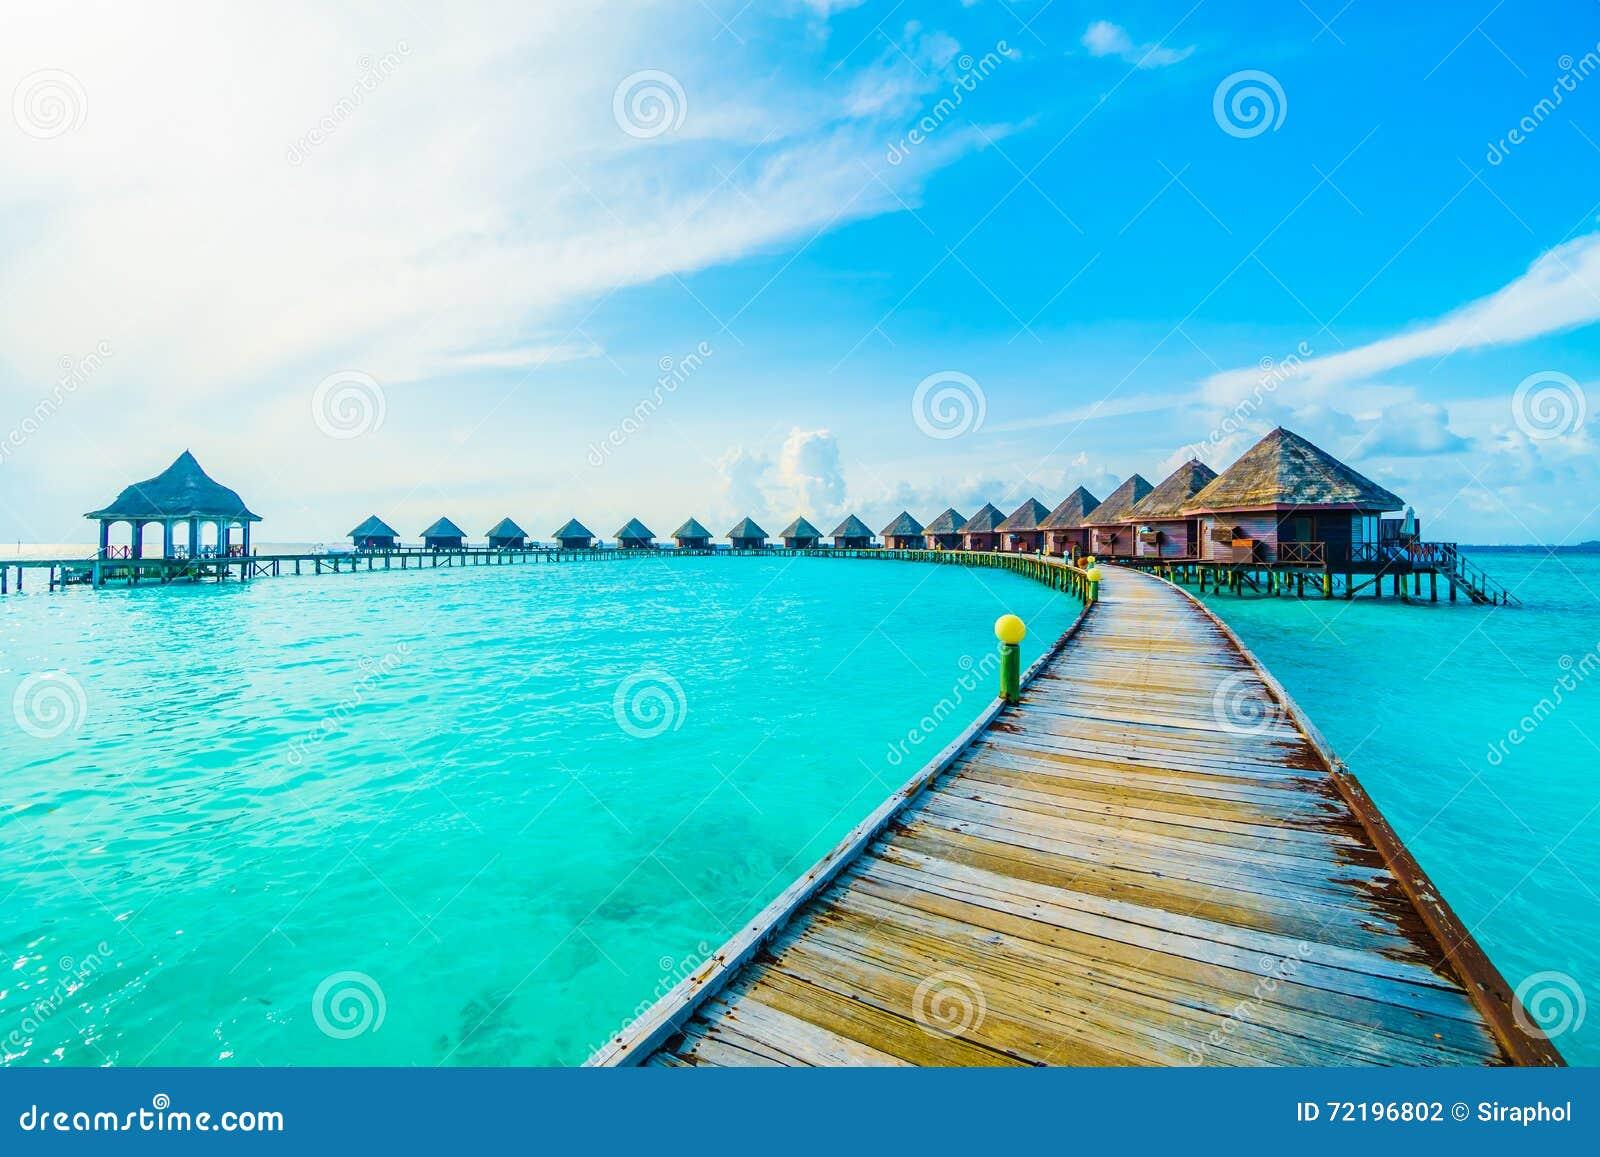 Maldives Island Stock Photo Image Of Hotel Tree Ocean